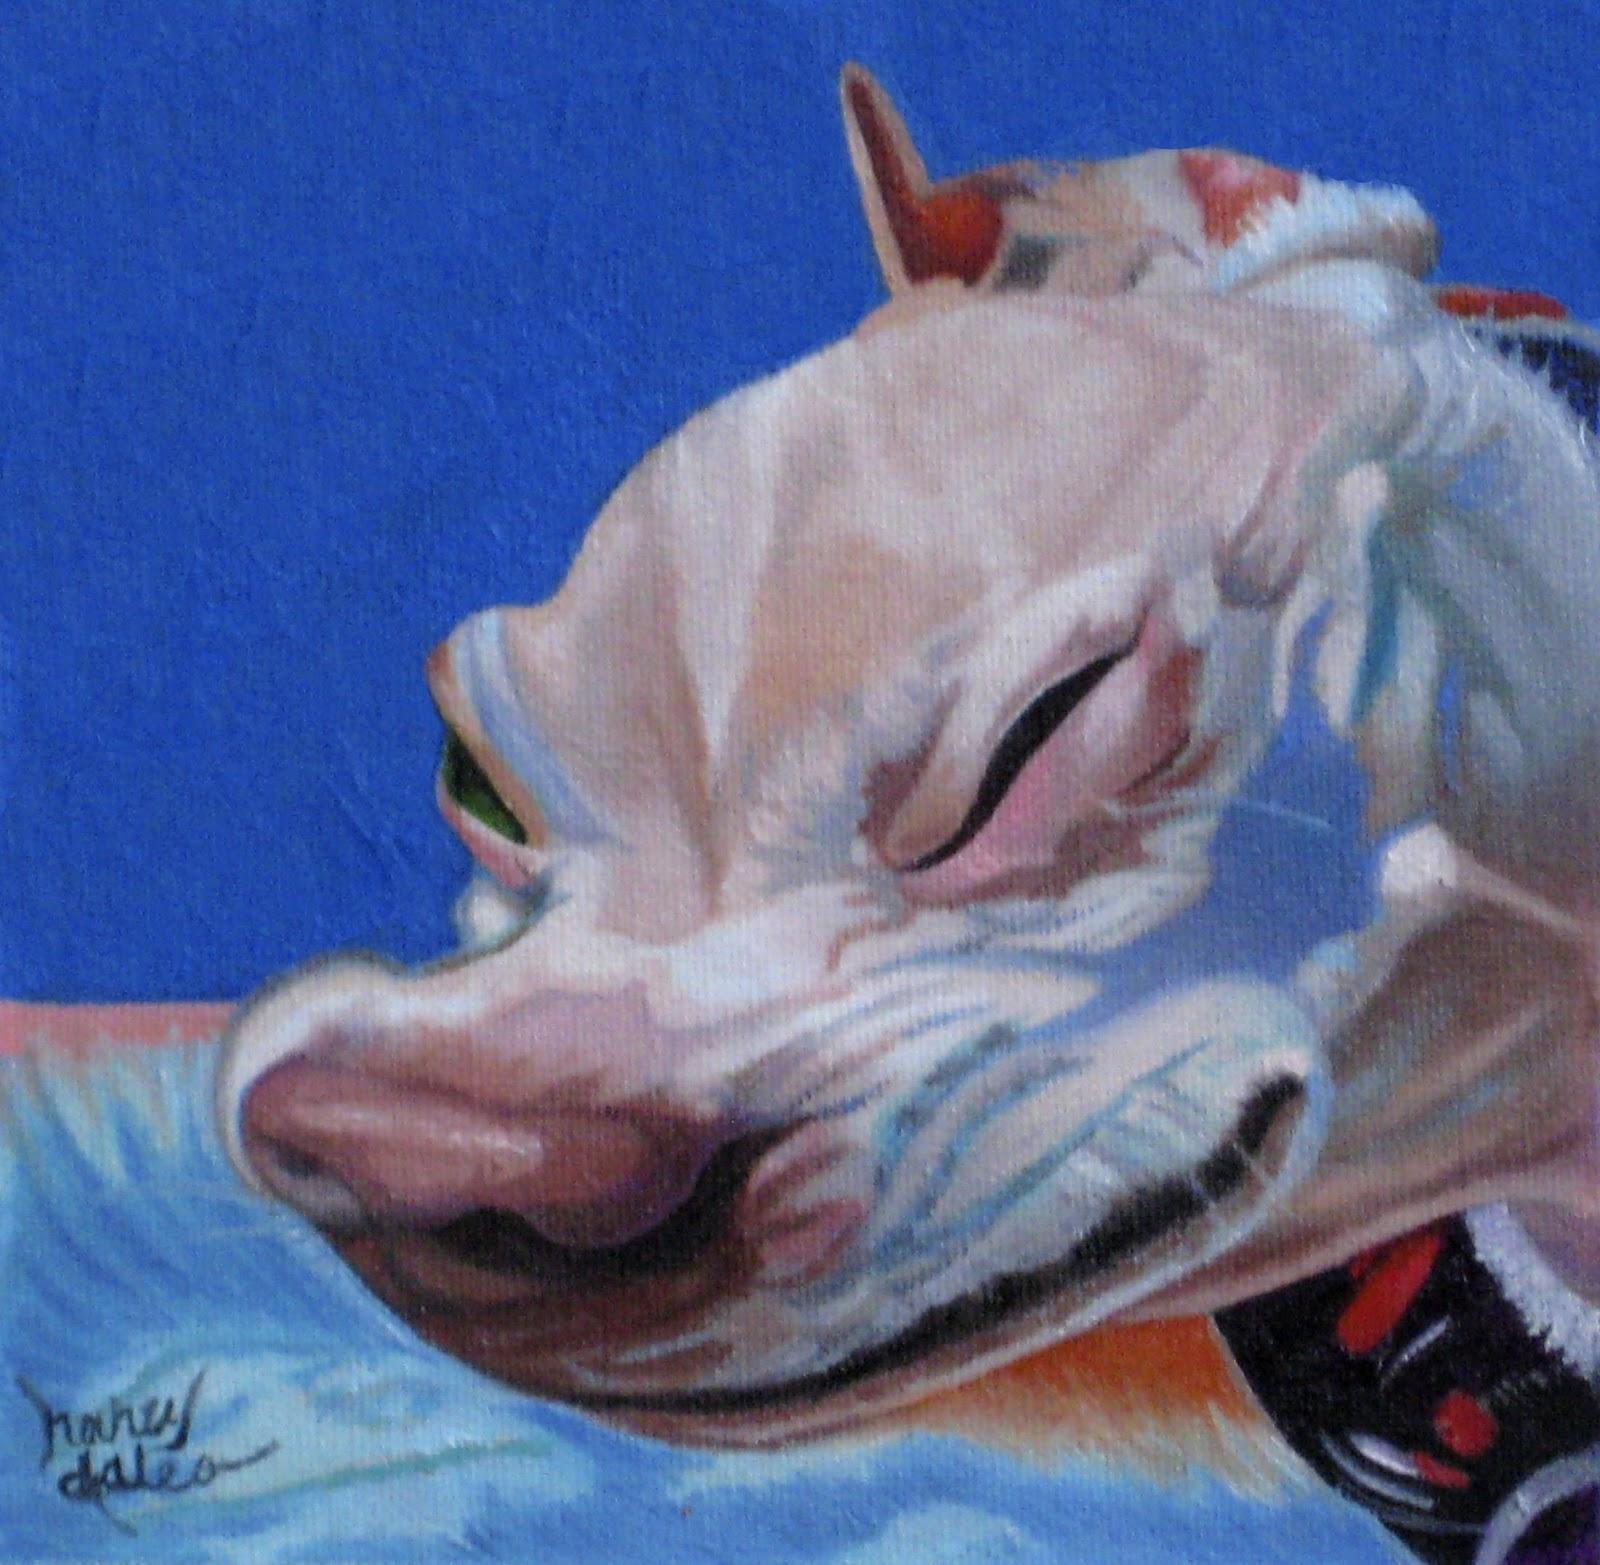 Art Of Hearts And Tails Achoo Deer Chihuahua Sneezing Original